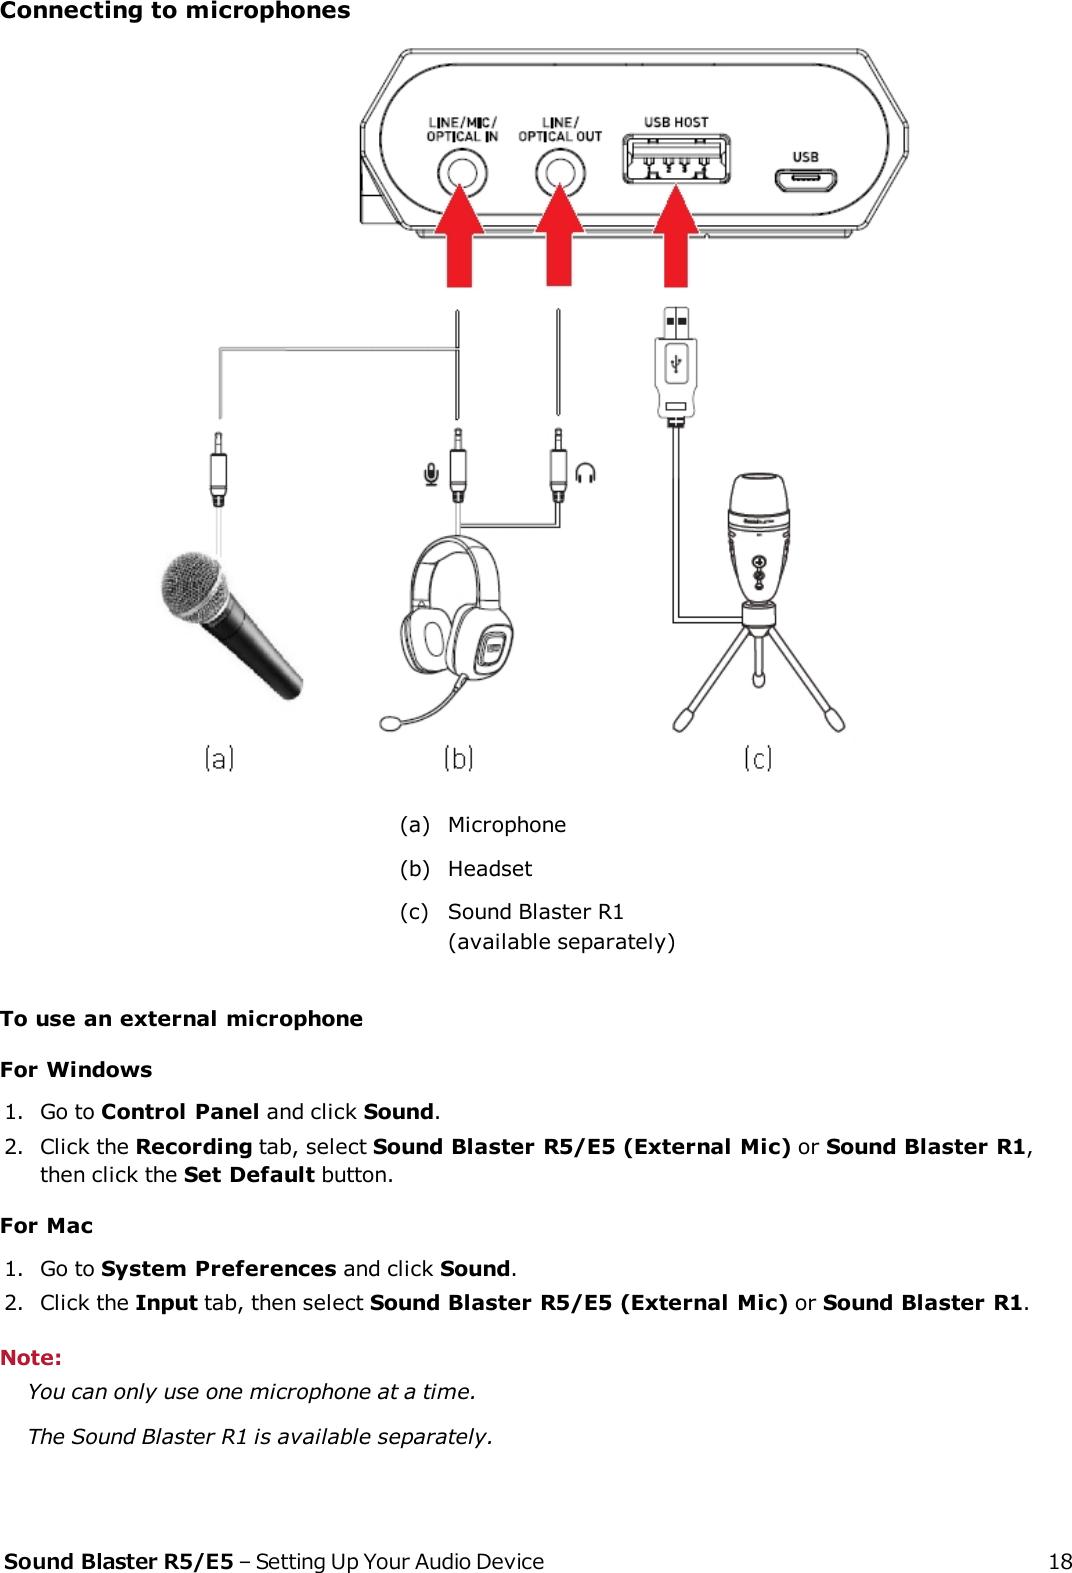 Creative Labs AVPSB1590 Sound Blaster E5 with Bluetooth